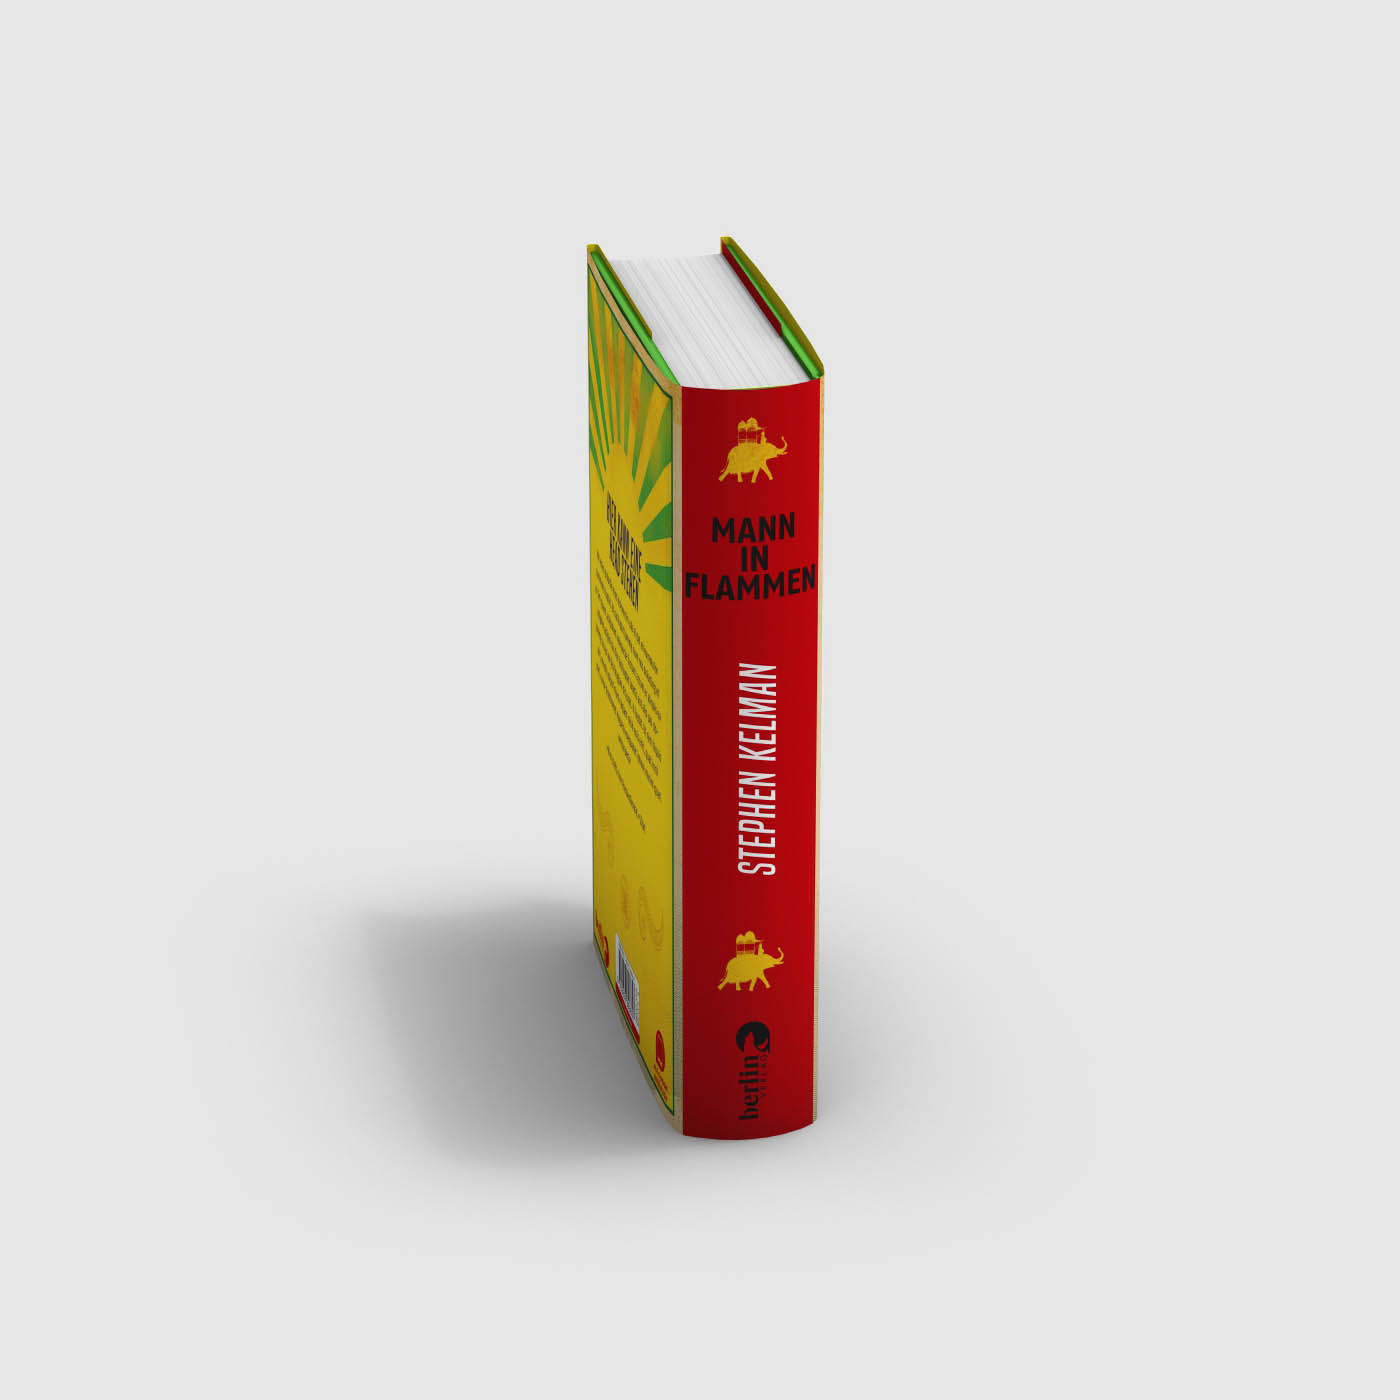 Stephen Kelman * Mann in Flammen * Berlin Verlag